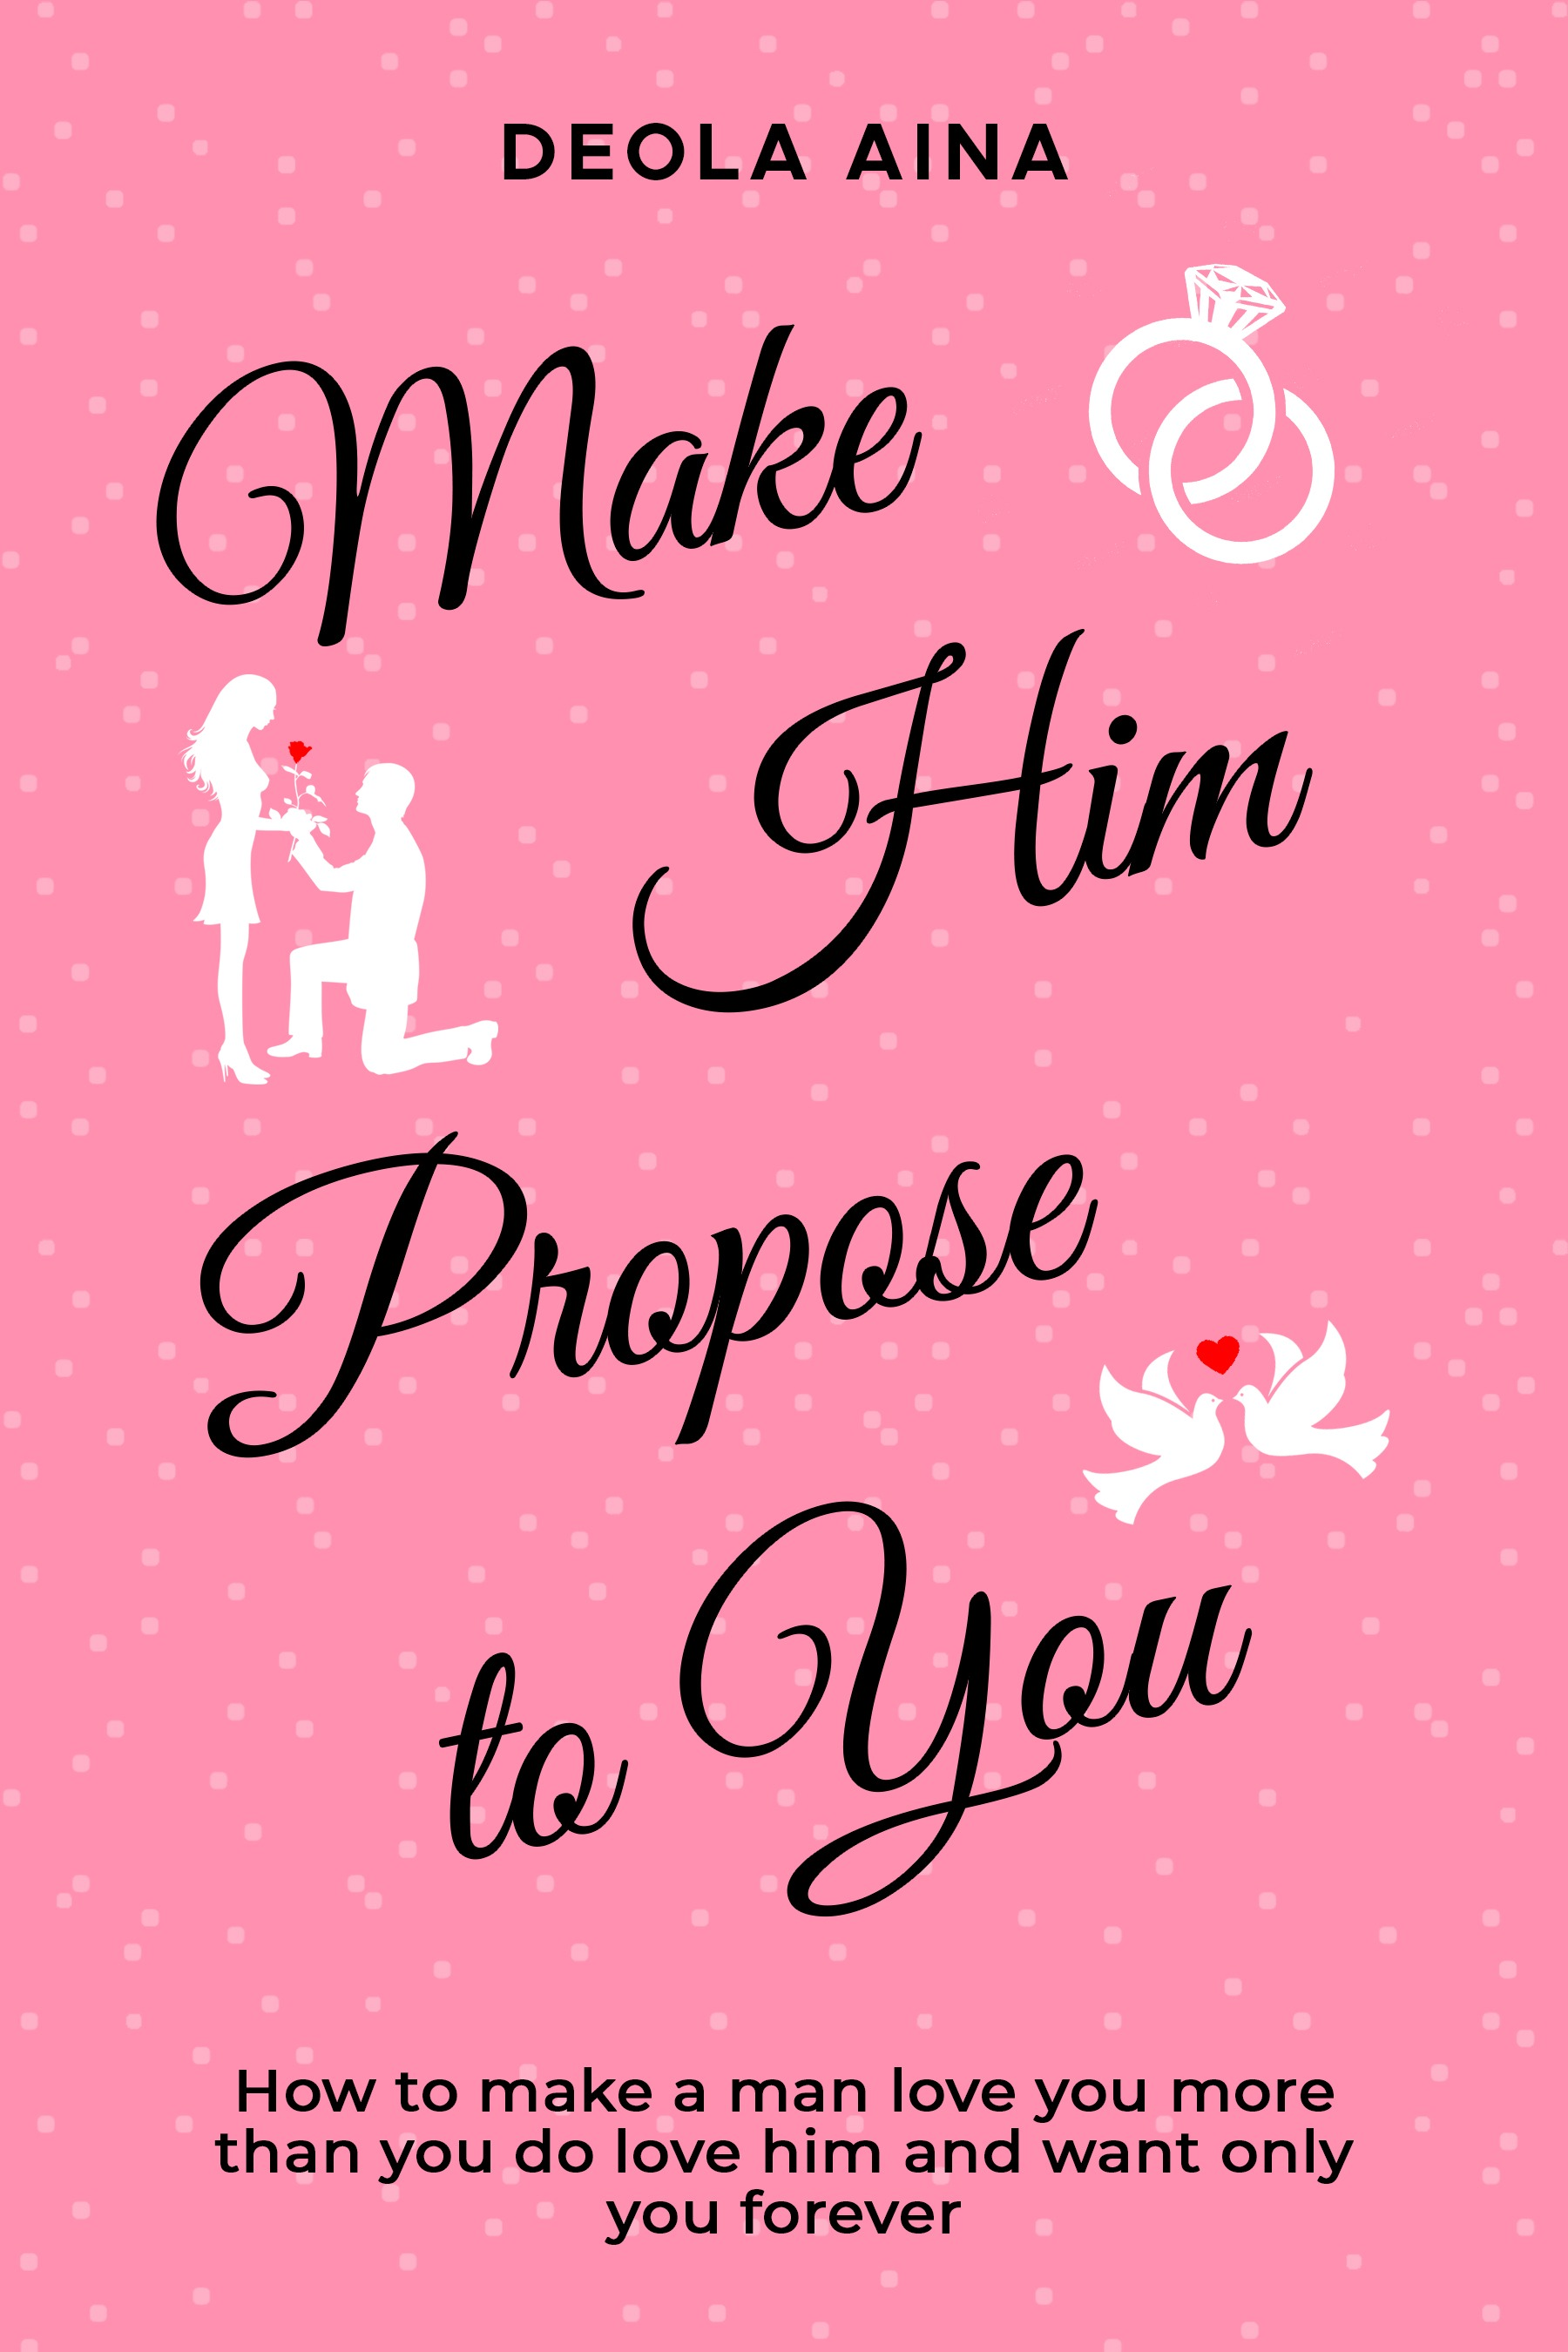 MAKE HIM PROPOSE TO YOU